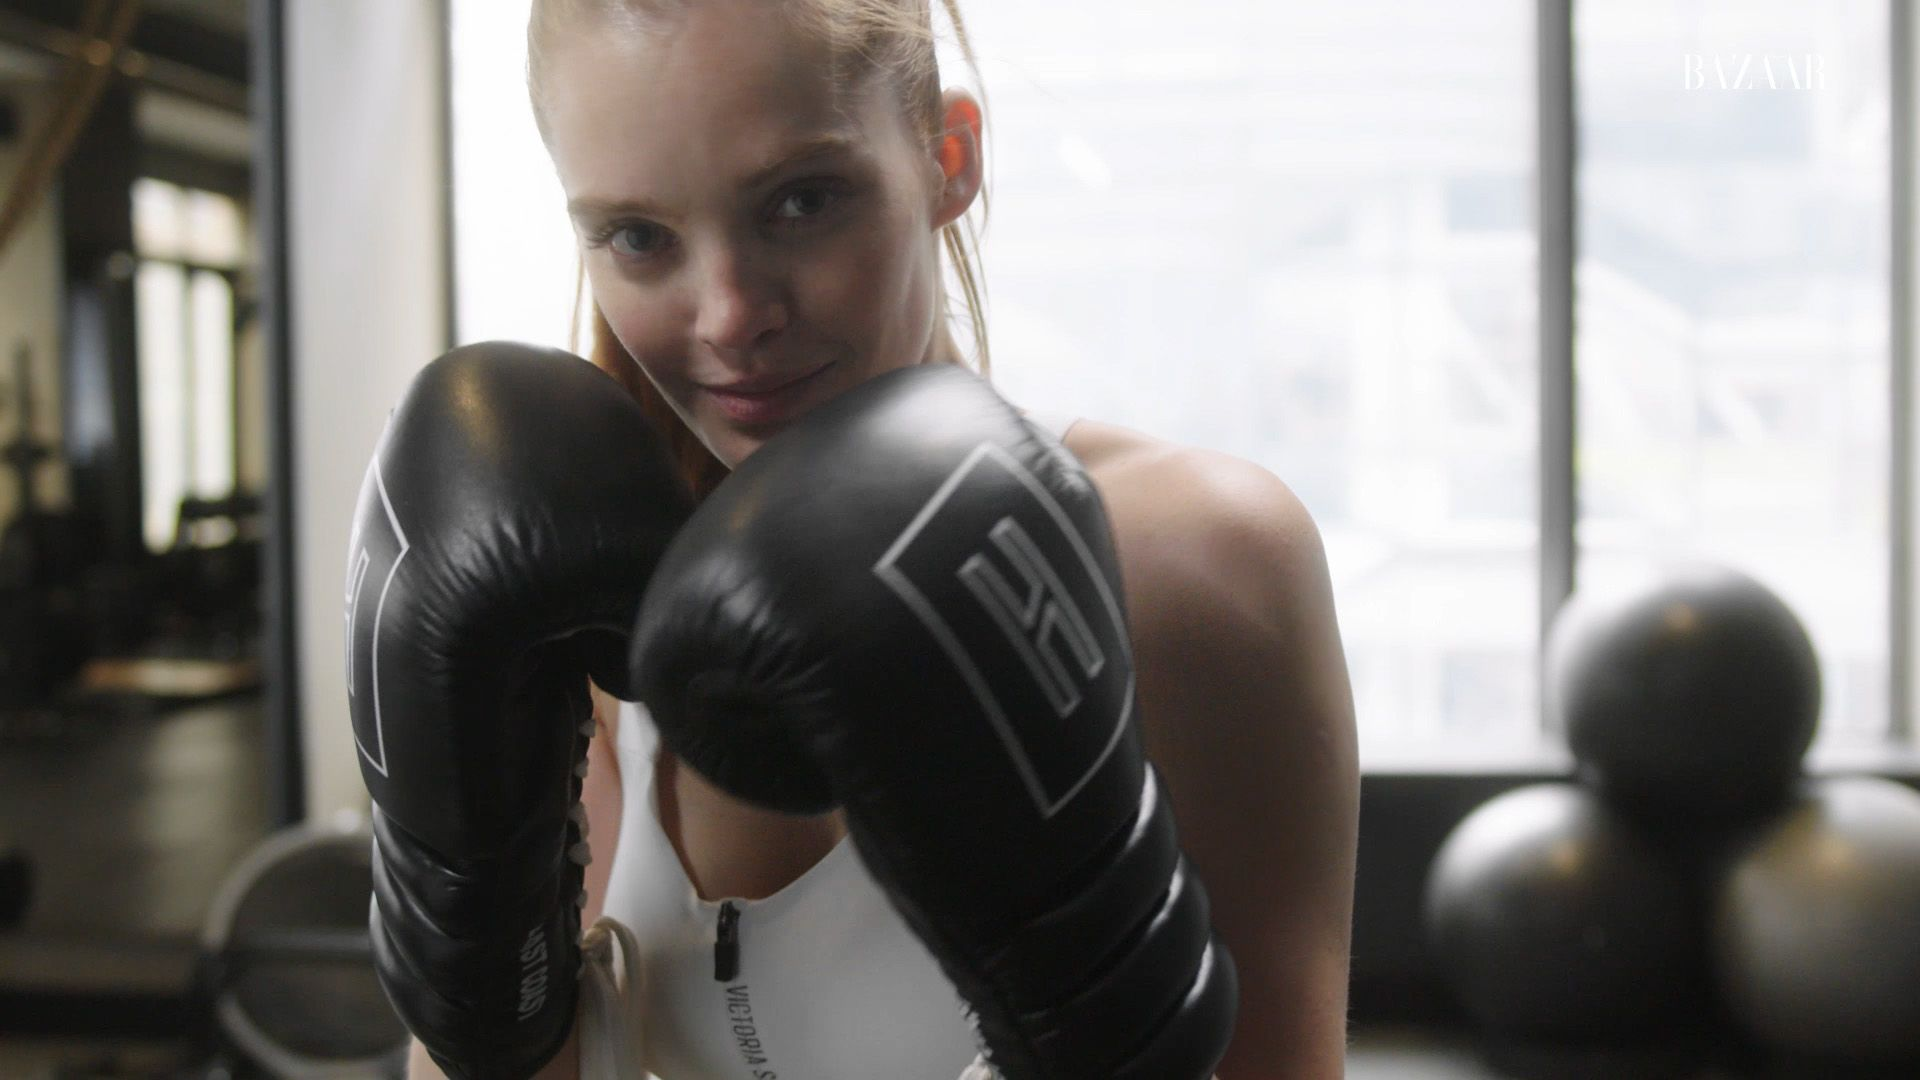 Watch Victoria's Secret Angel Alexina Graham's Intense Boxing Workout